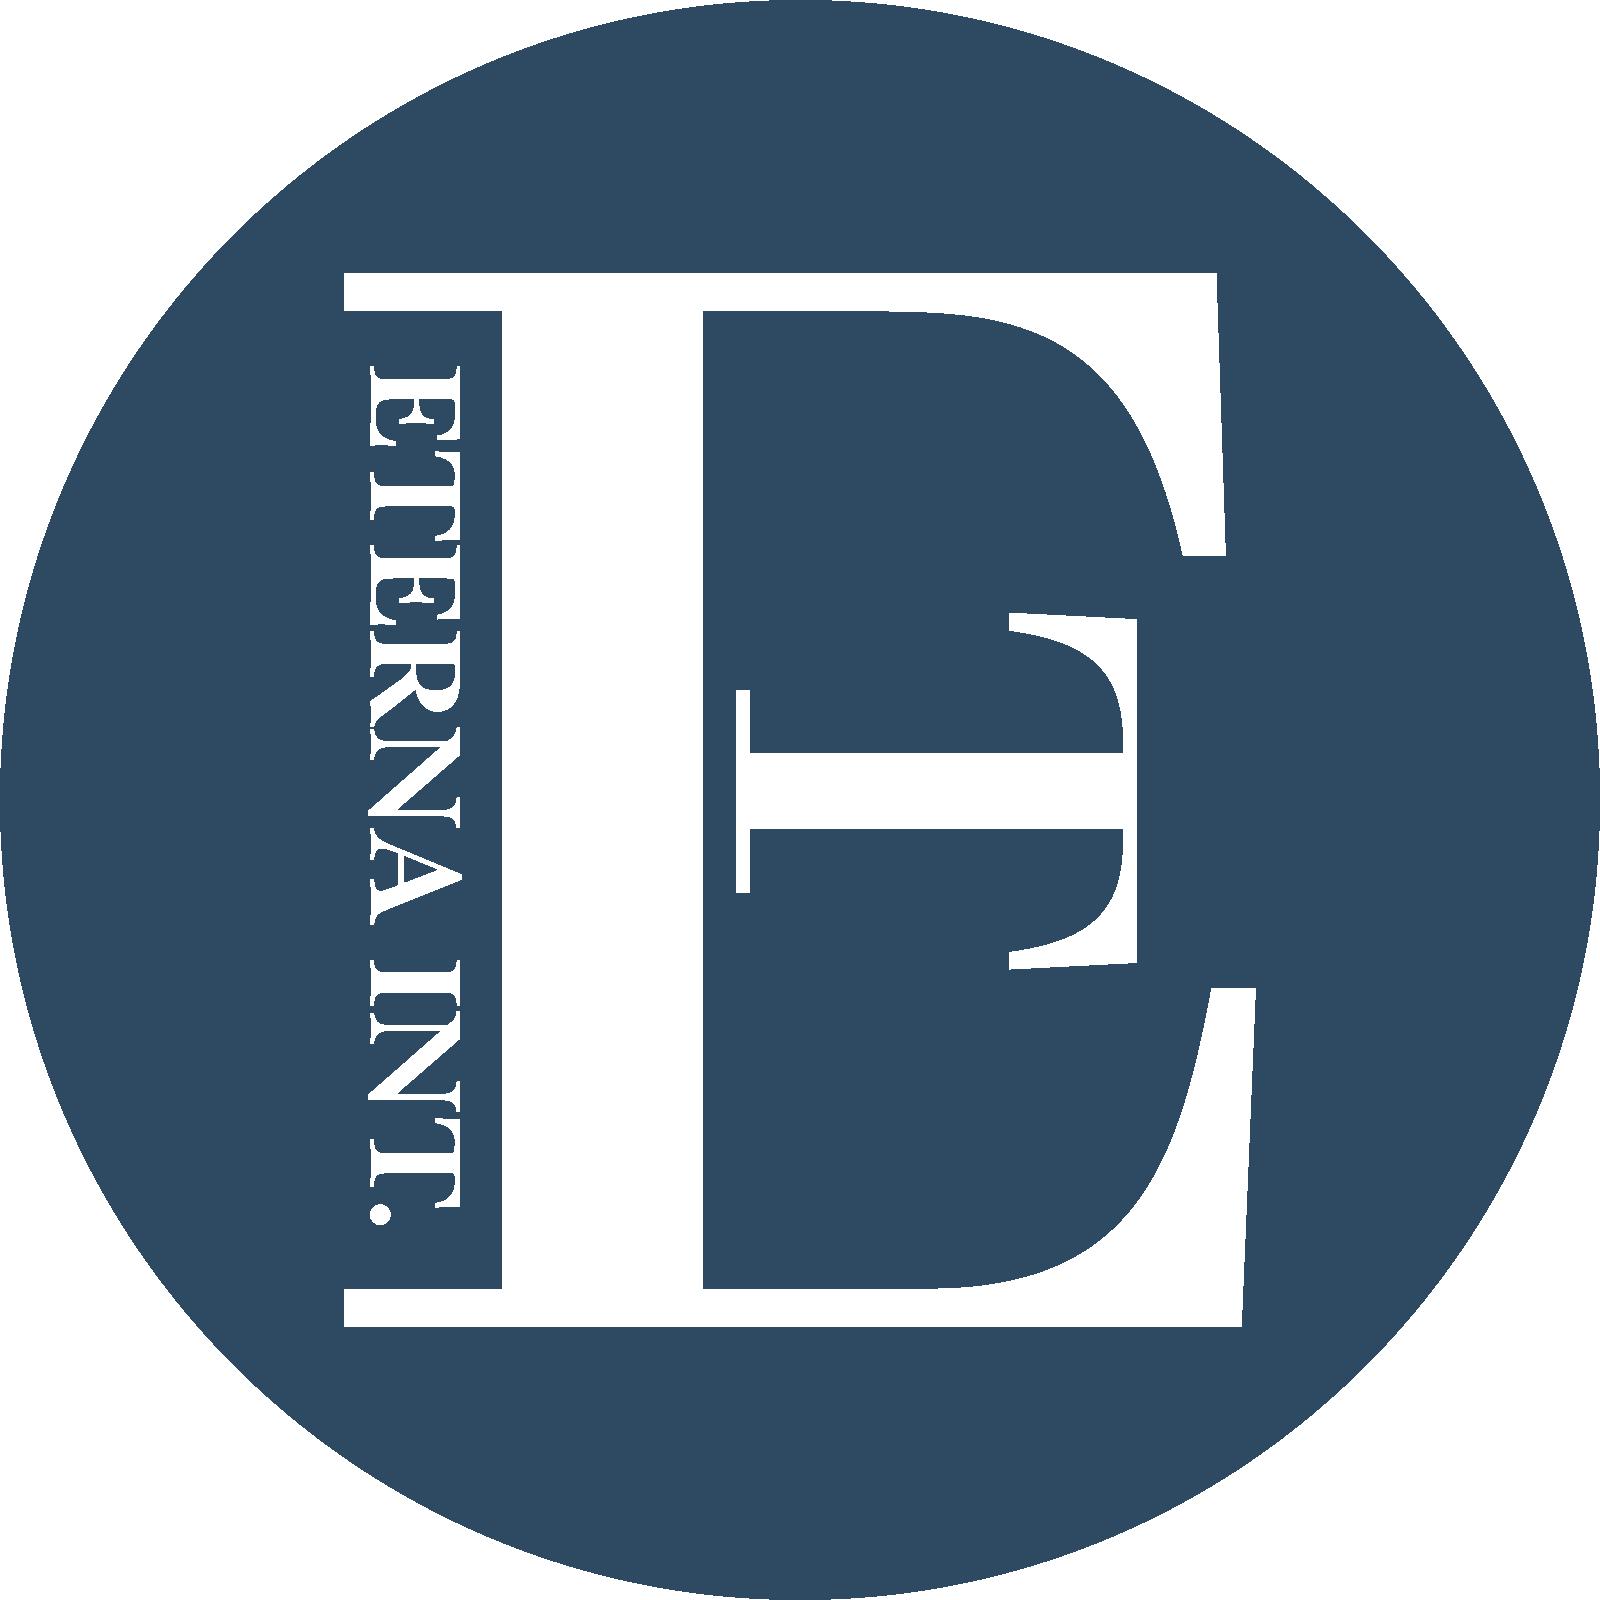 Eterna International HK Limited - Partenaire de Magog Technopole